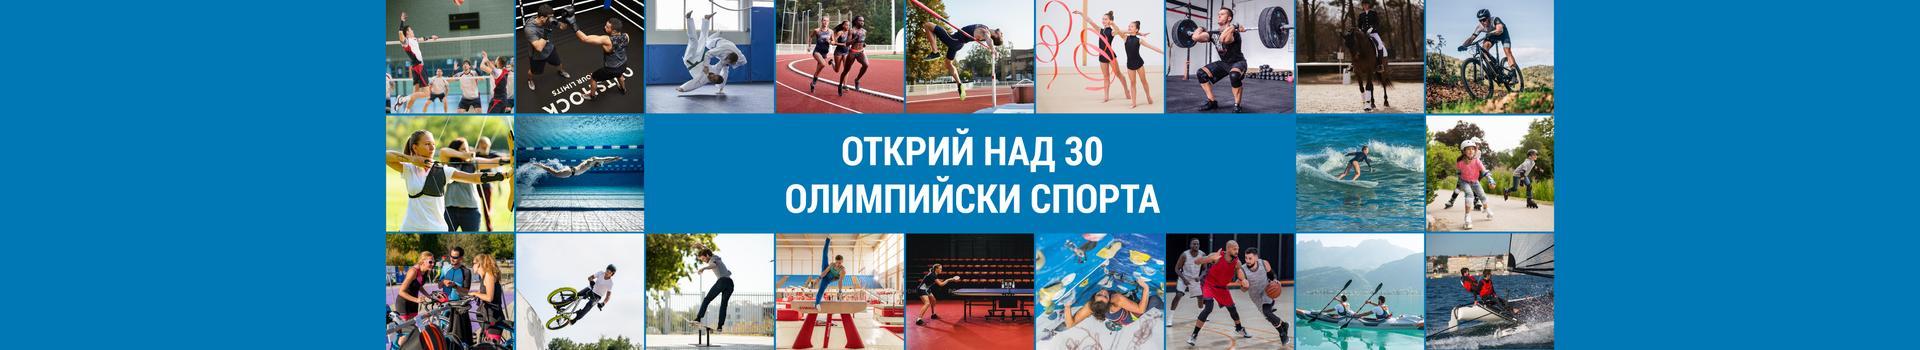 1920x350px_olimpics-01.jpg